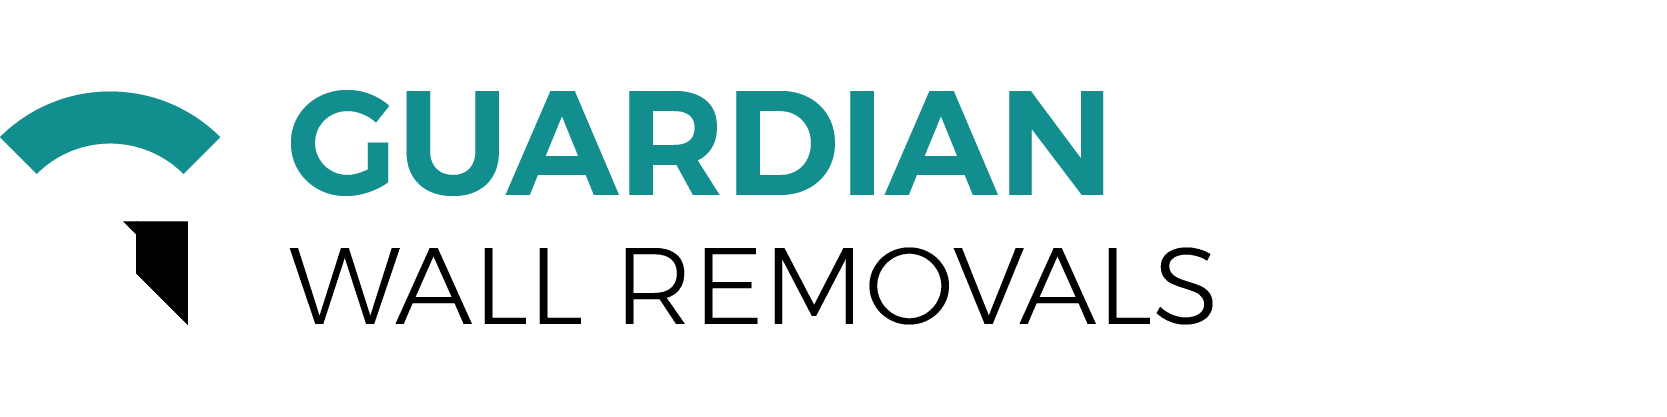 Guardian Chimney Removals